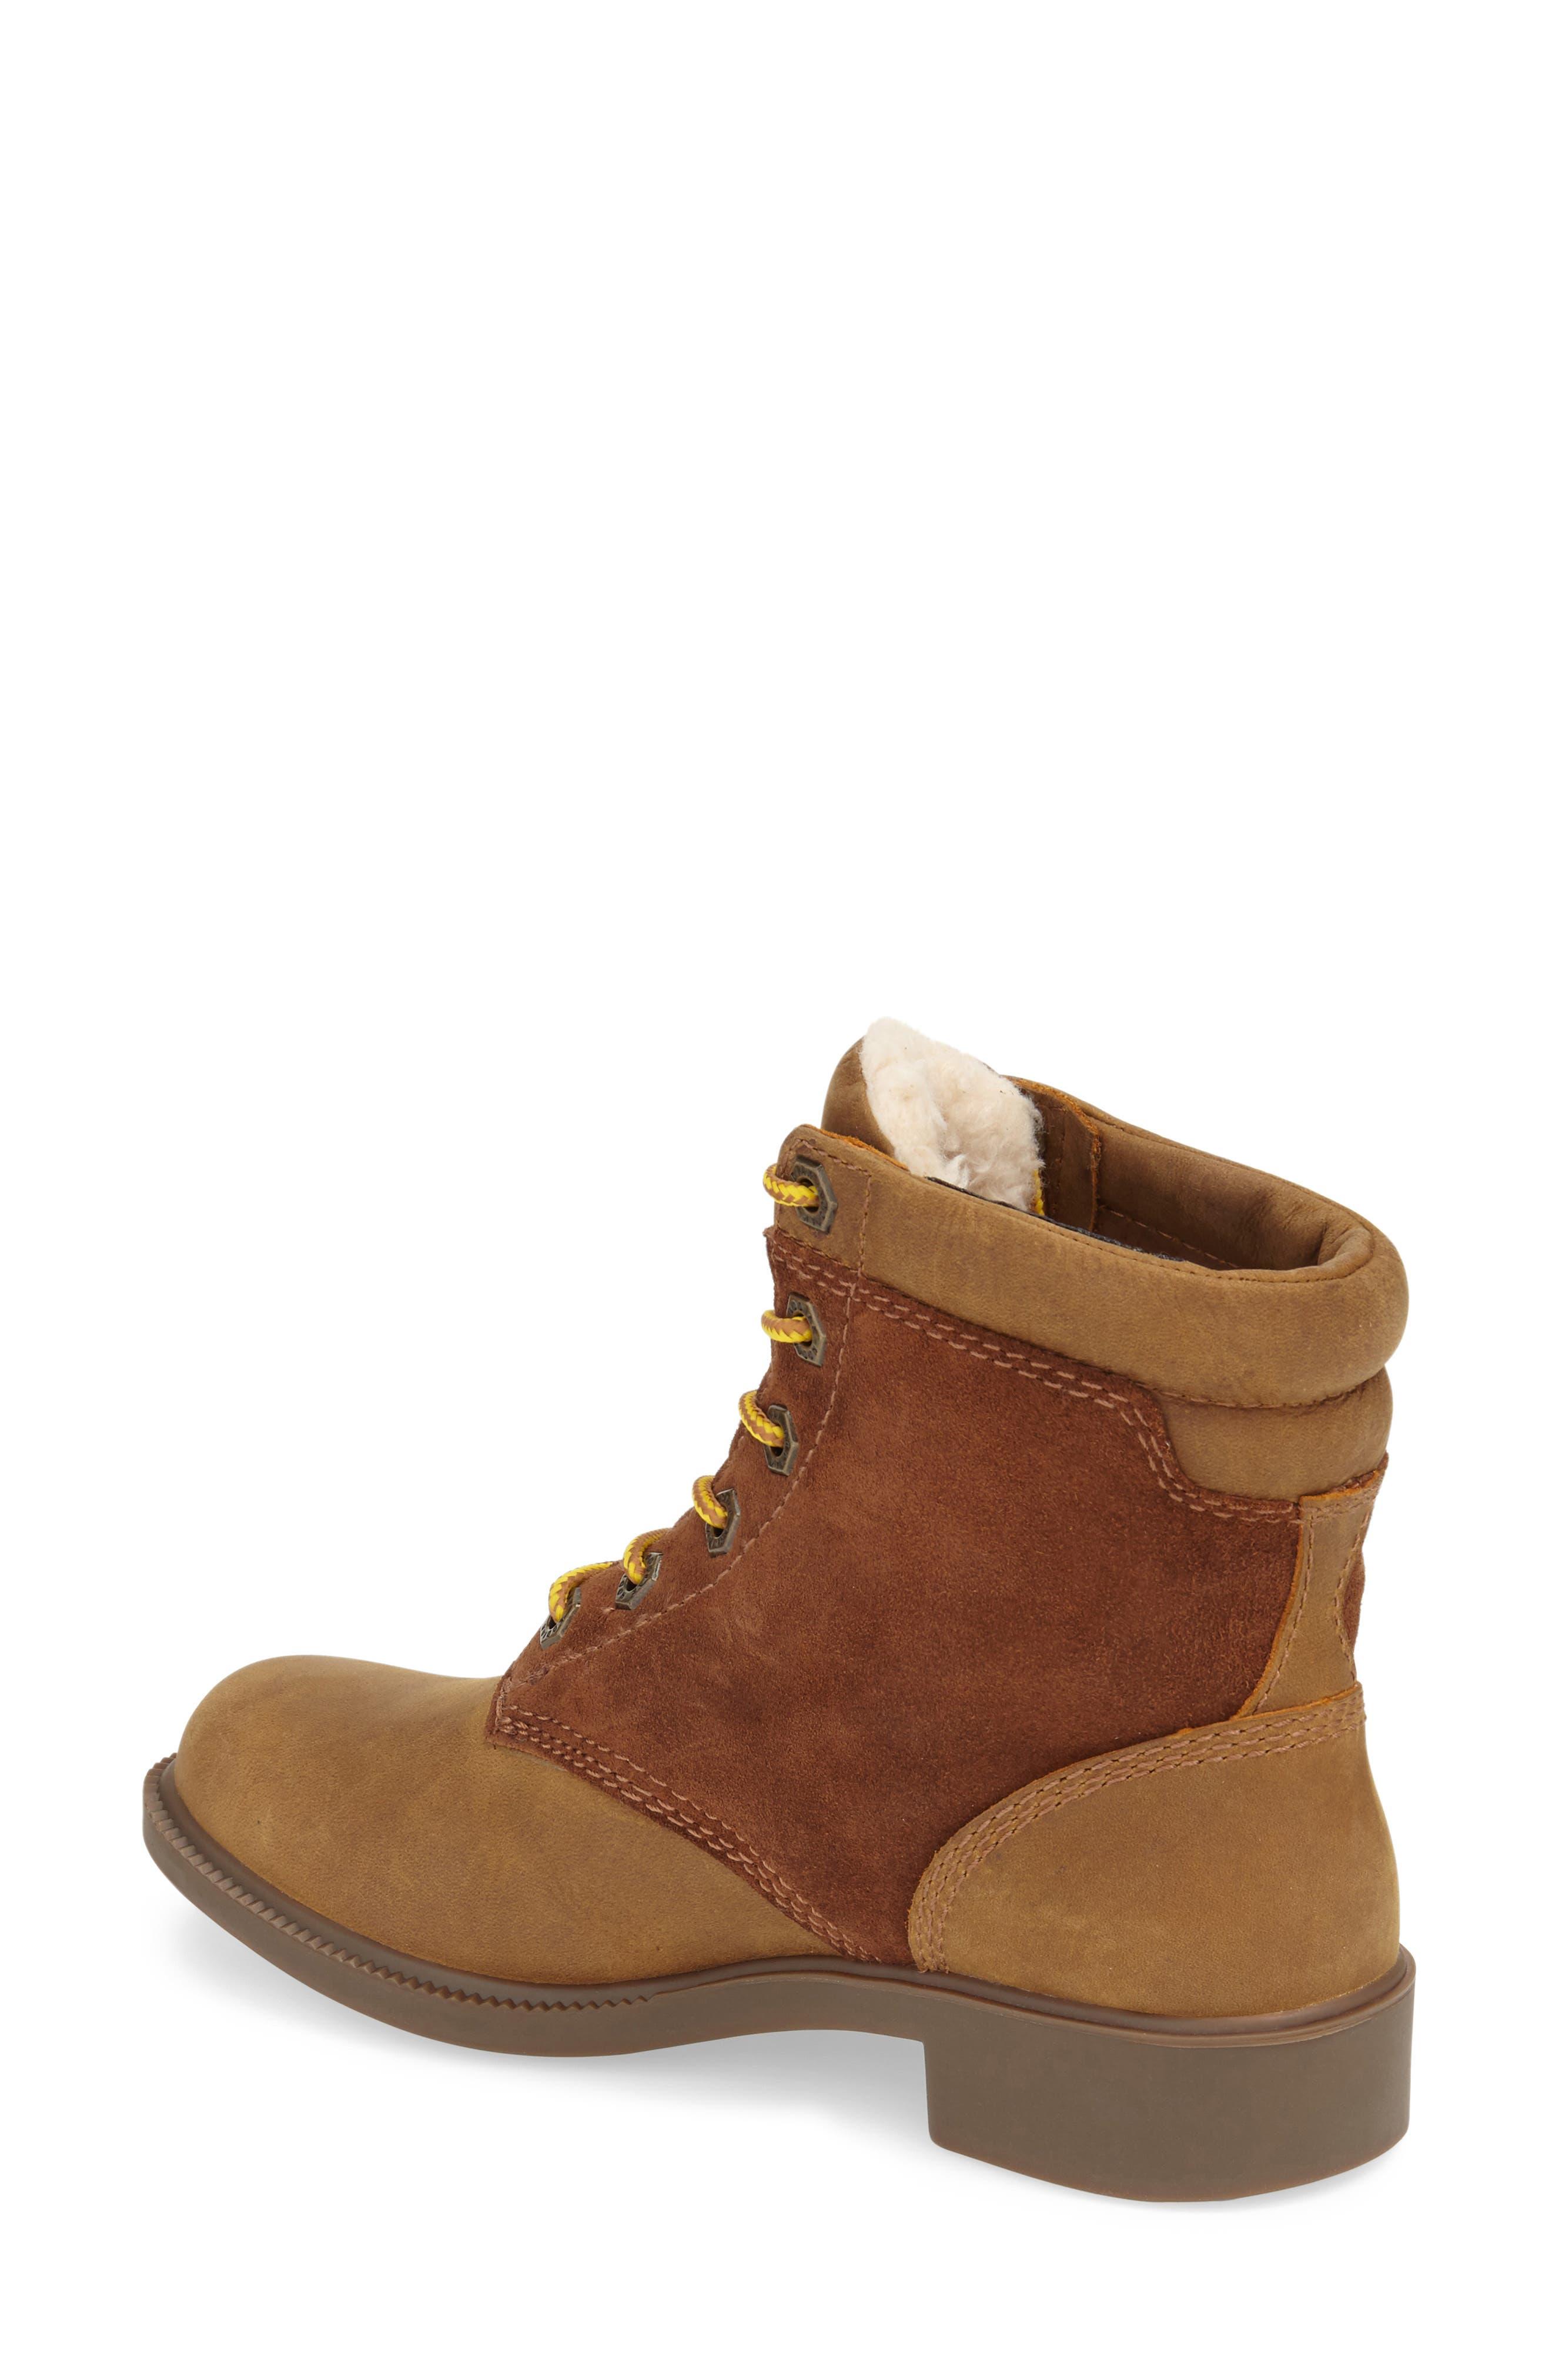 Original Waterproof Fleece Boot,                             Alternate thumbnail 2, color,                             240